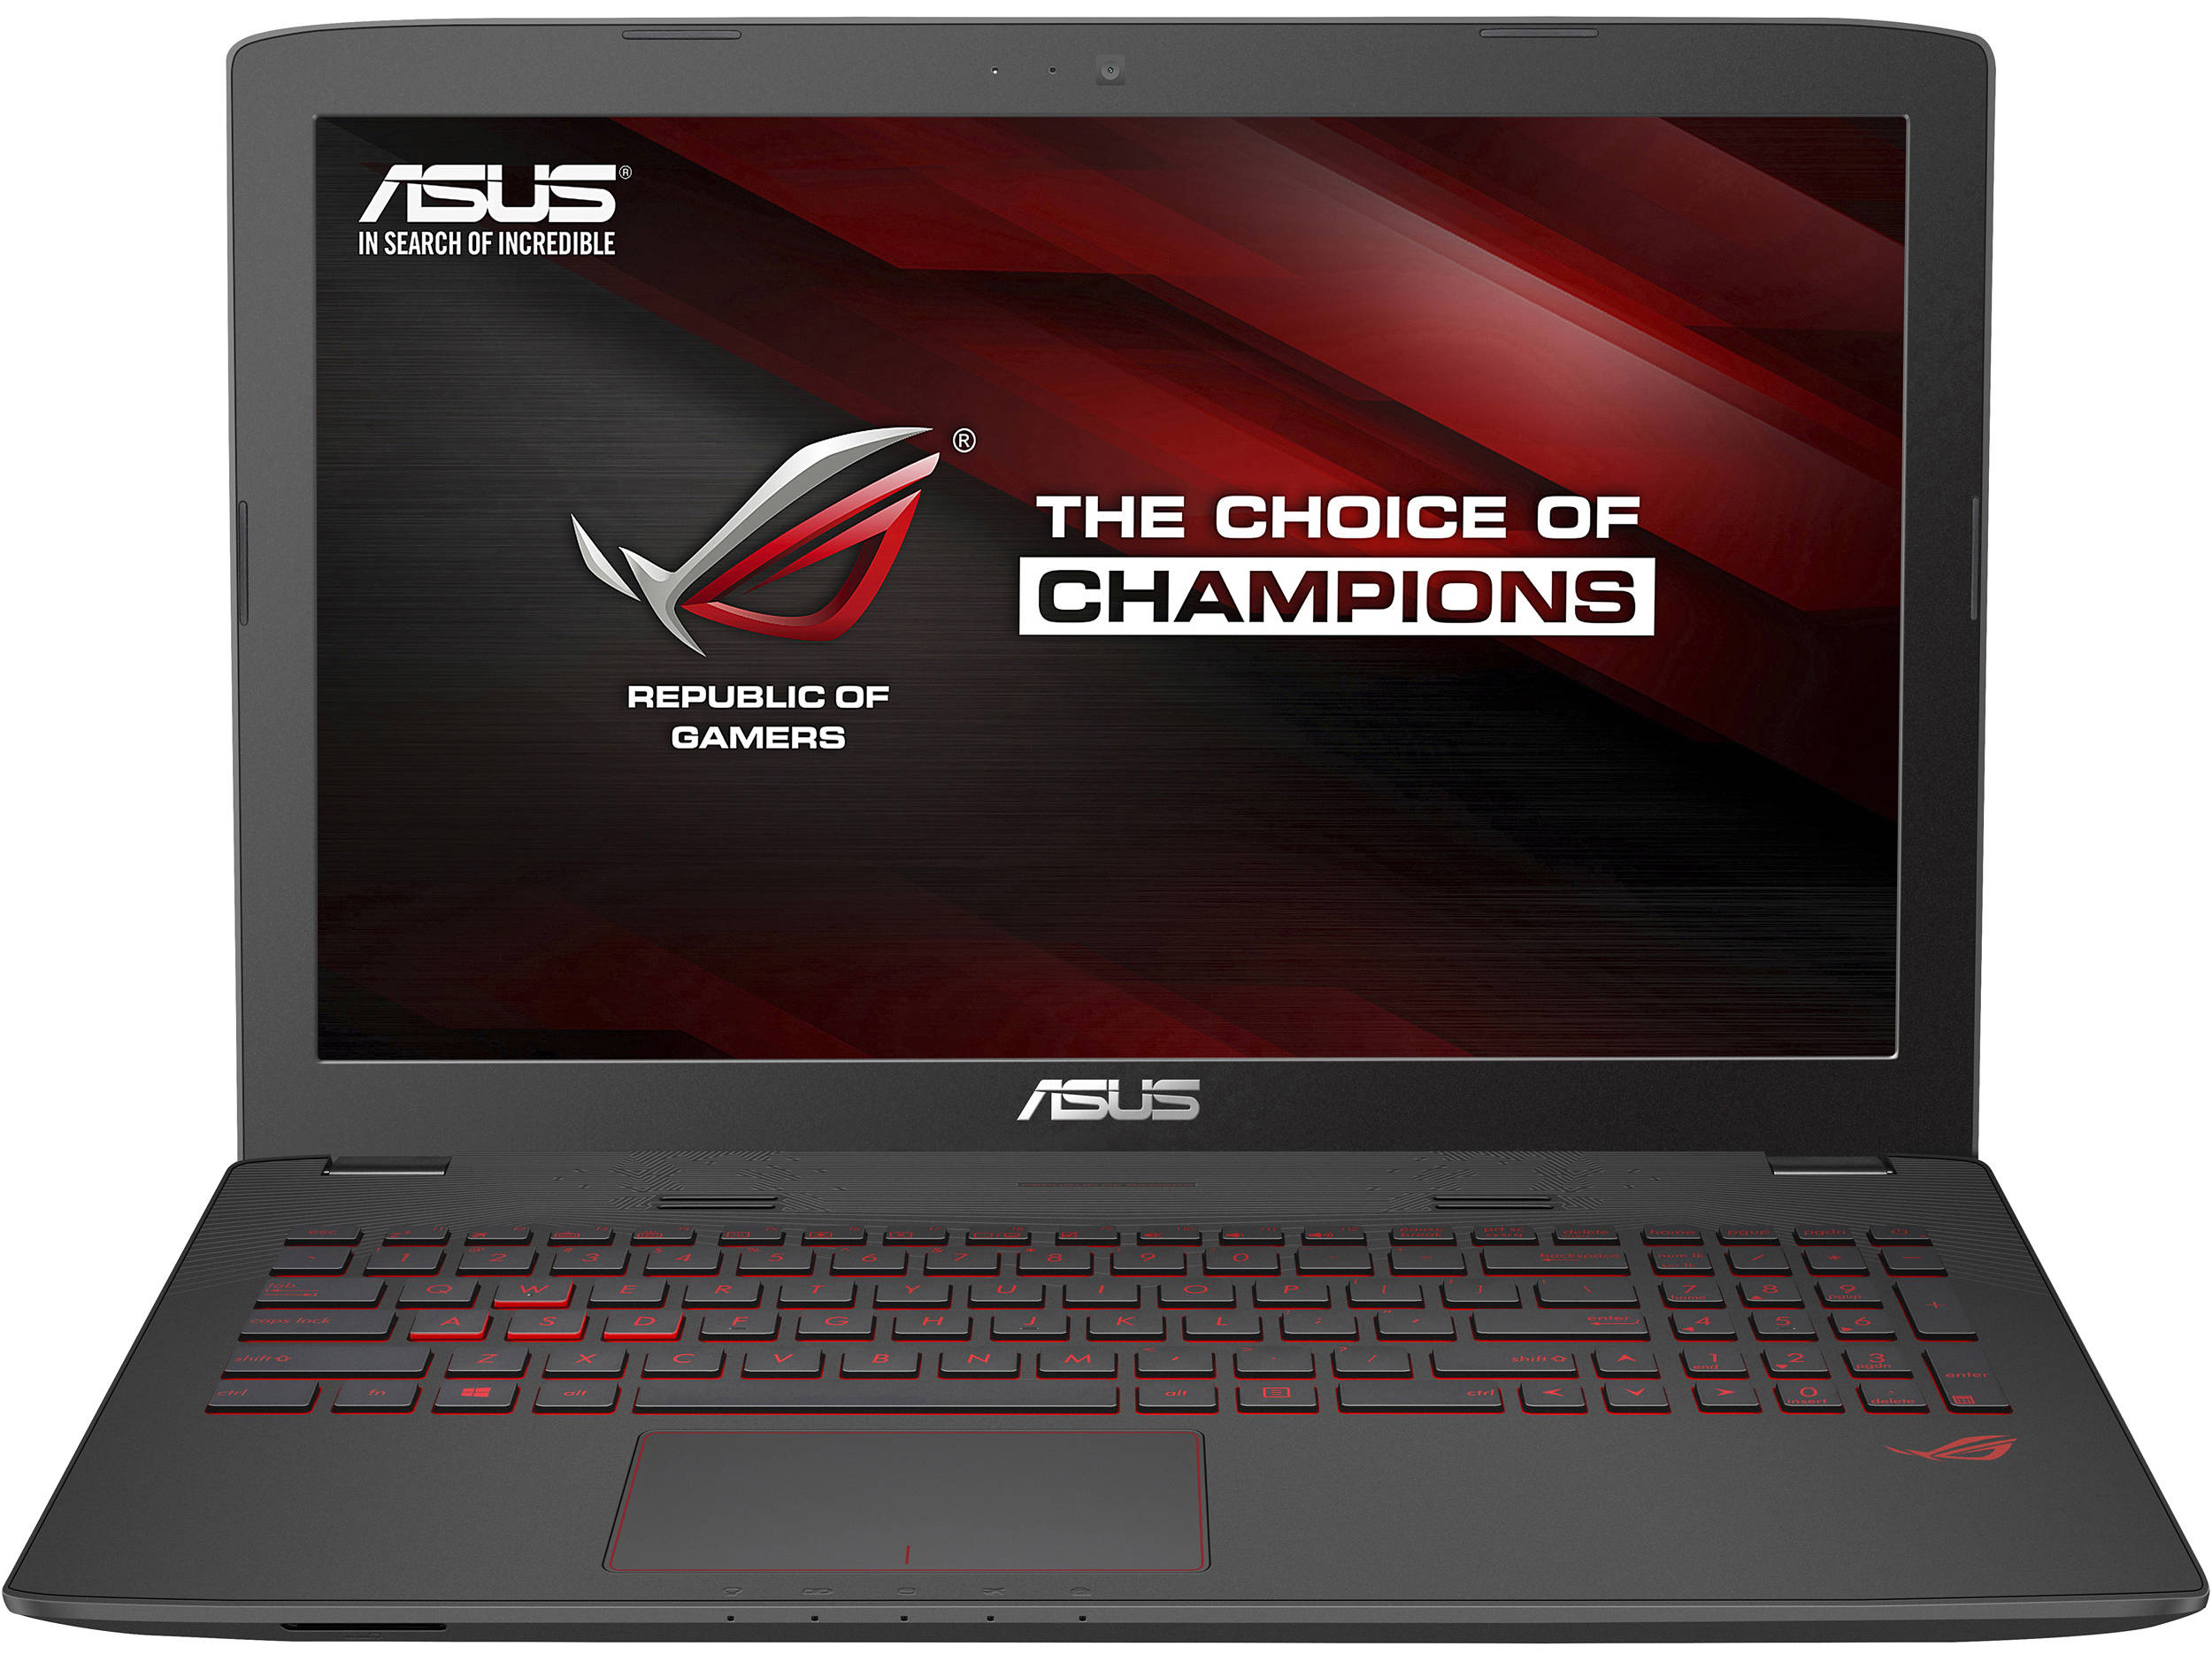 Laptop Asus GL552VX-DM143D -I5-6300H-8GB DRRL4-1TB-15.6